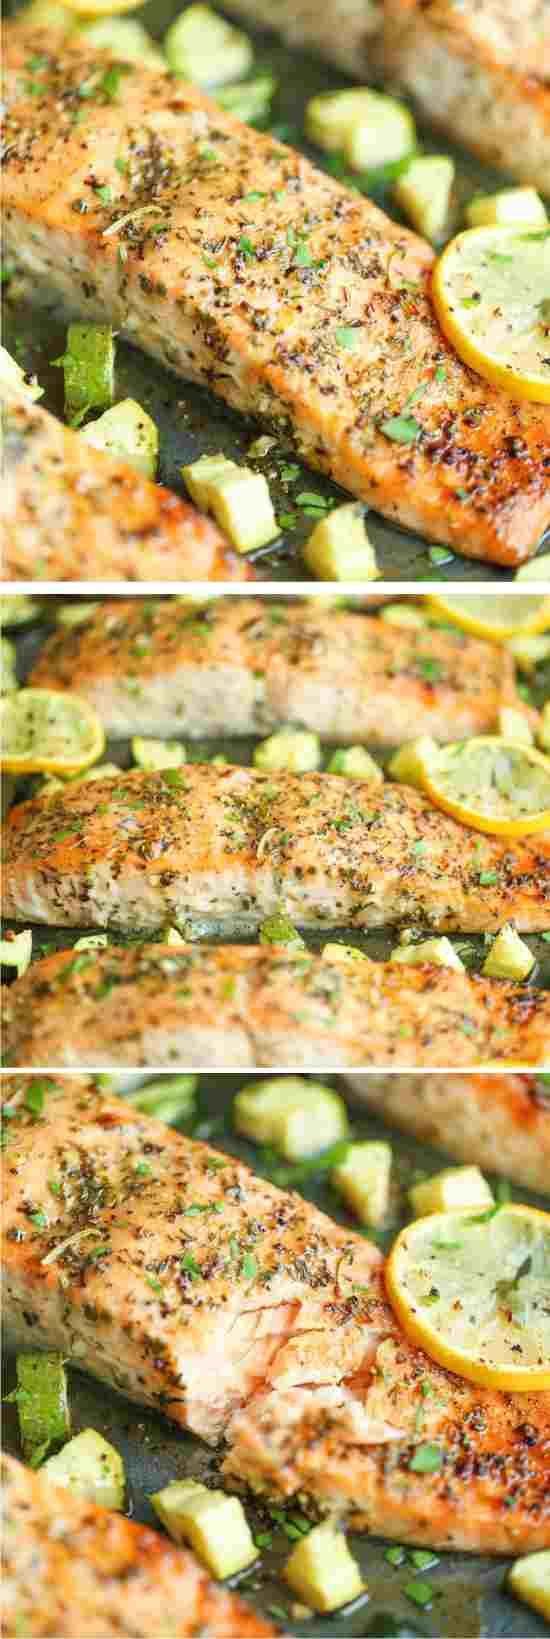 LEMON HERB SALMON AND ZUCCHINI - blackpepper, healthy, herbal, lemon, mustard, recipes, rosemary, salmon, zucchini